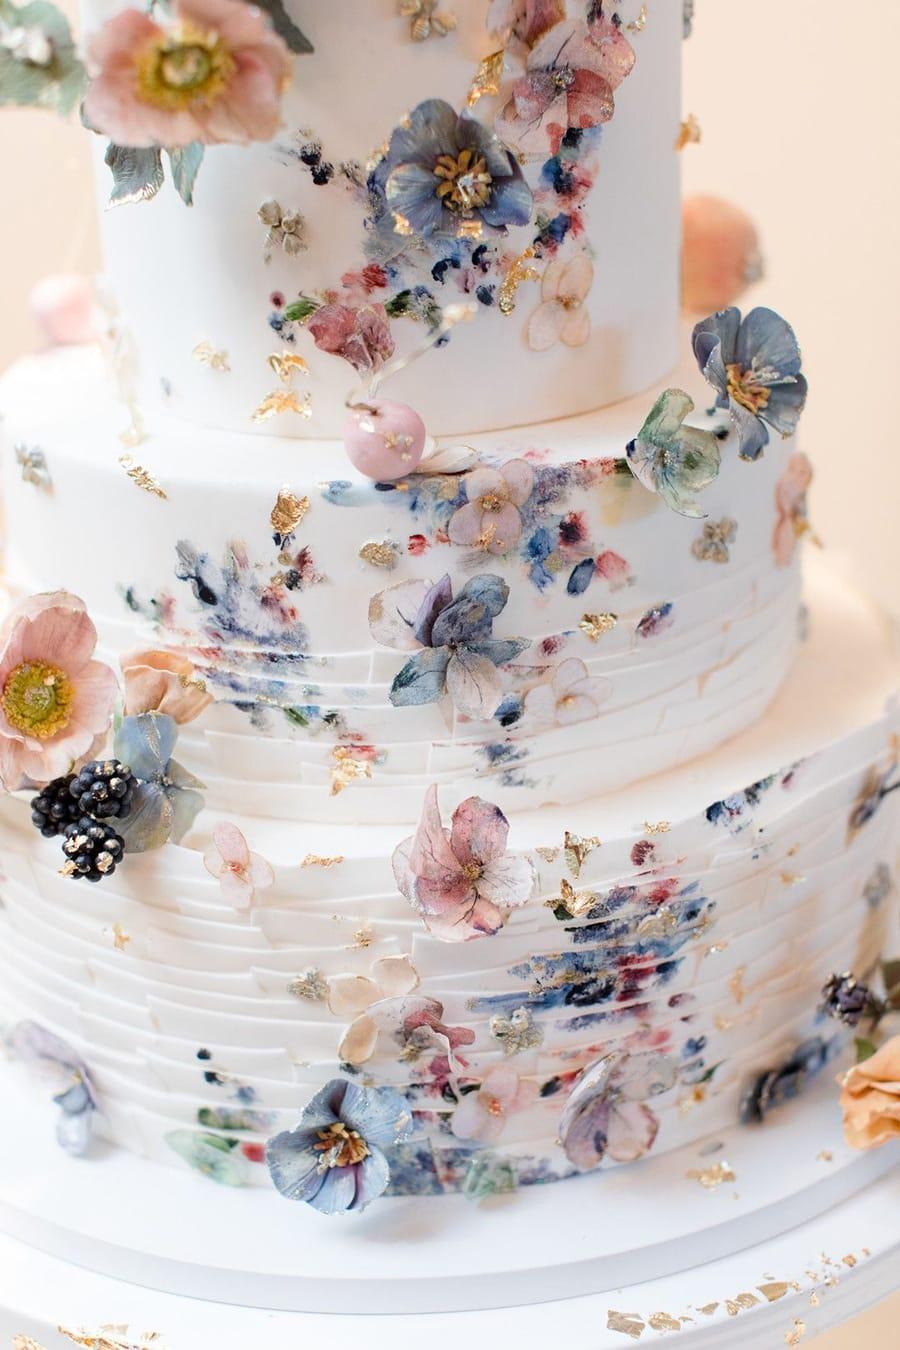 Spring pastel painted fondant wedding cake with delicate sugar flowers and gold leaf | Photography: Jaye Kogut